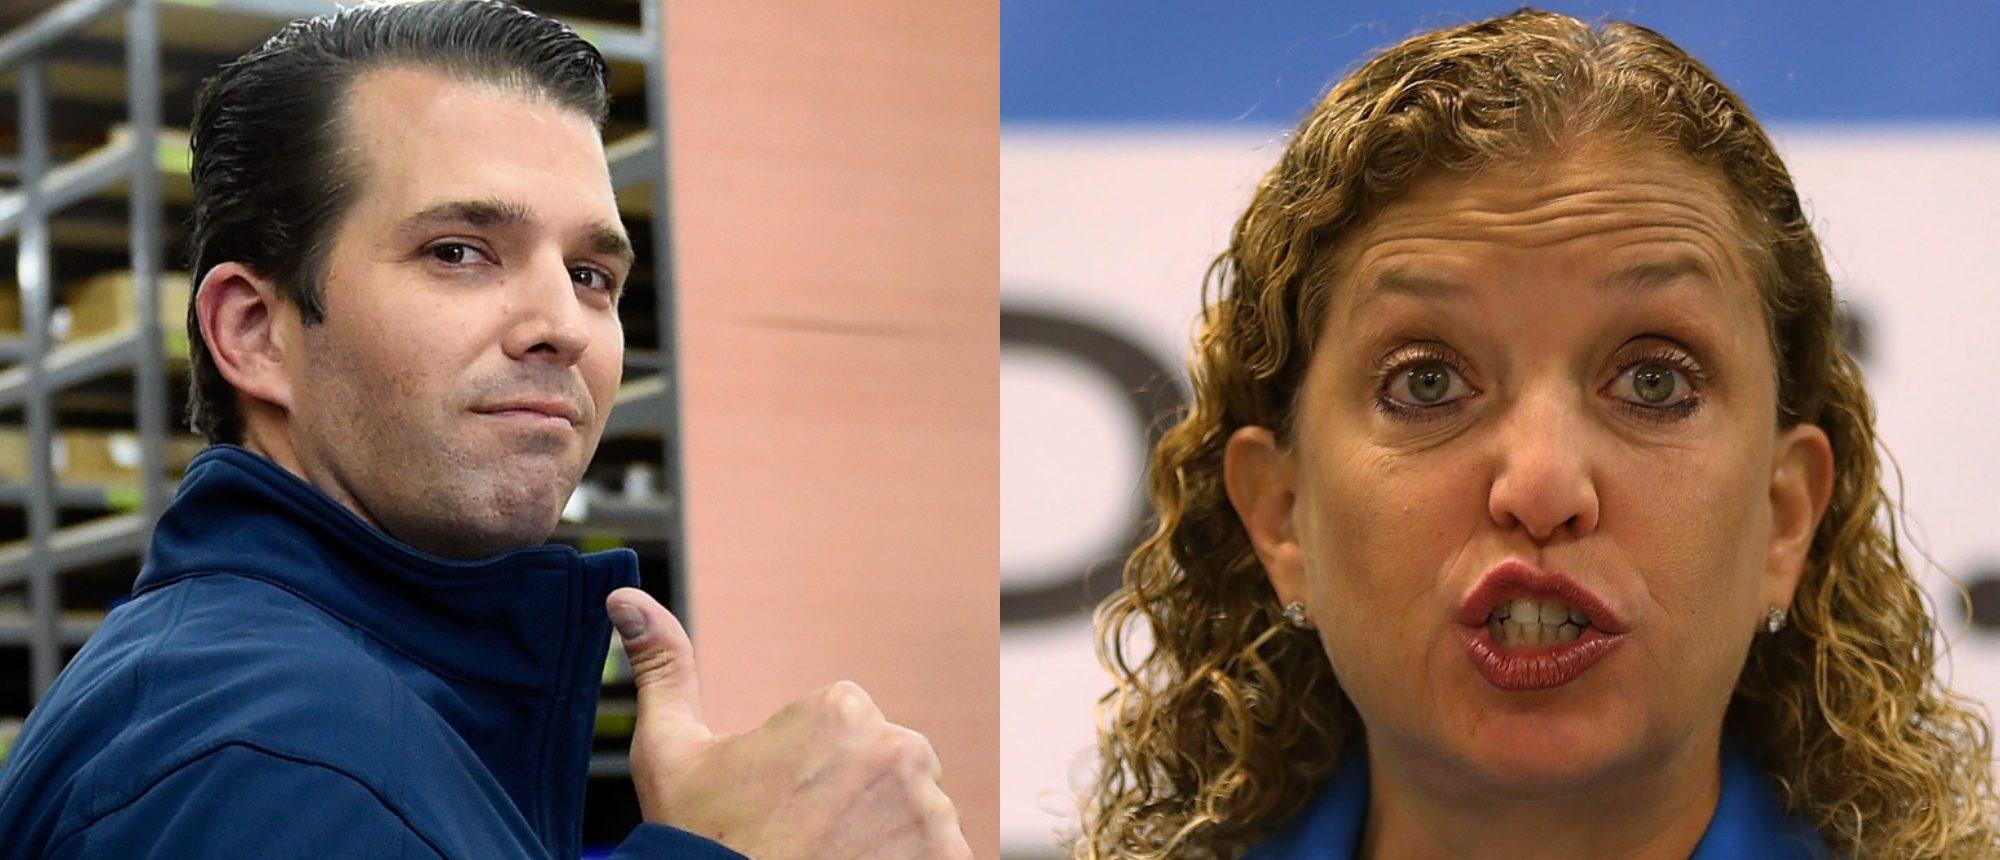 Donald Trump Jr, Debbie Waserman Schultz (Getty Images)